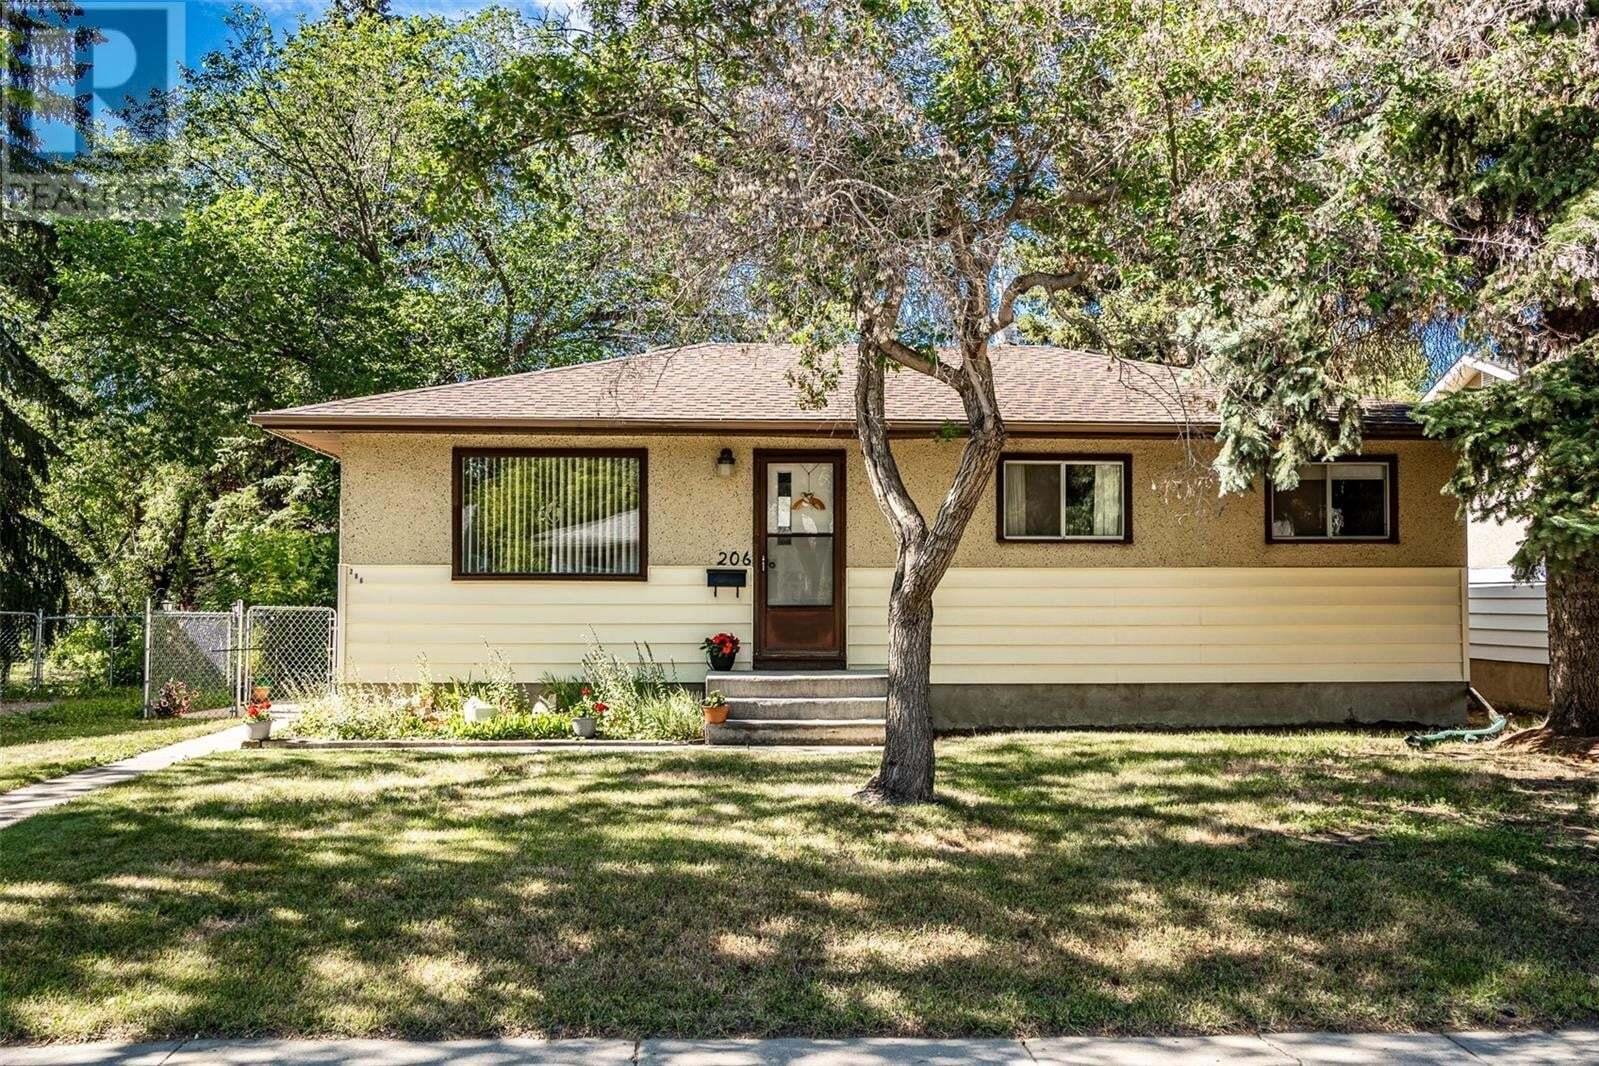 House for sale at 206 Evans St Saskatoon Saskatchewan - MLS: SK819753